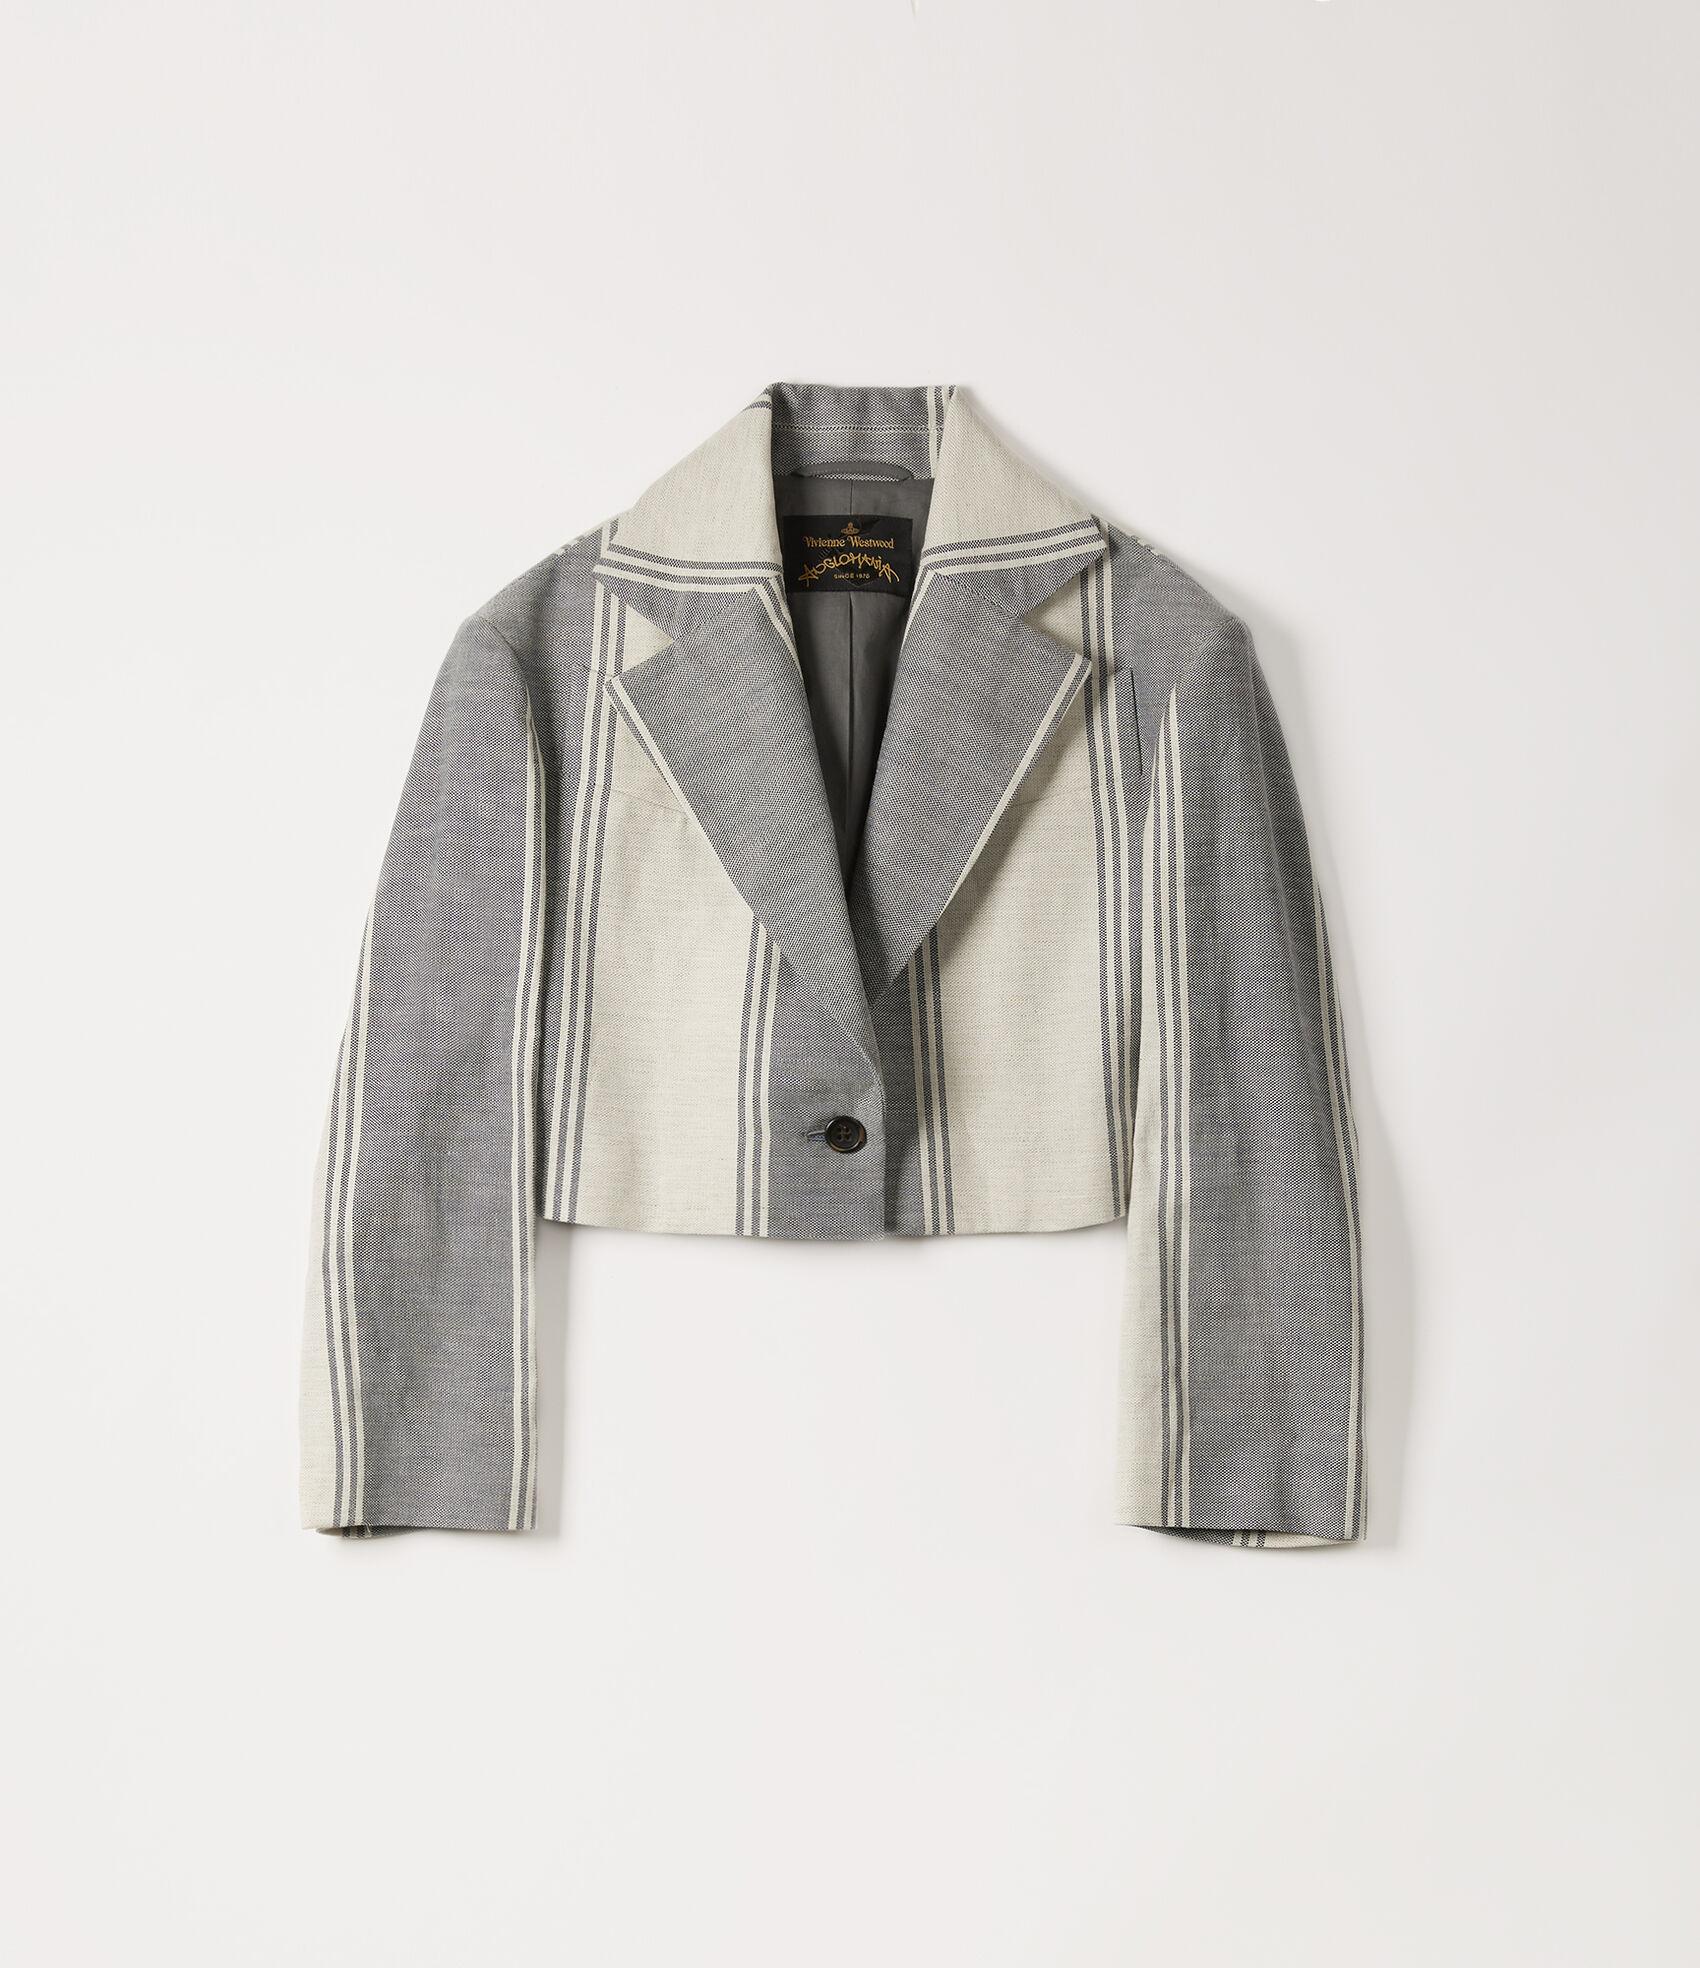 52507895609a5 Cropped Jacket Blue/White